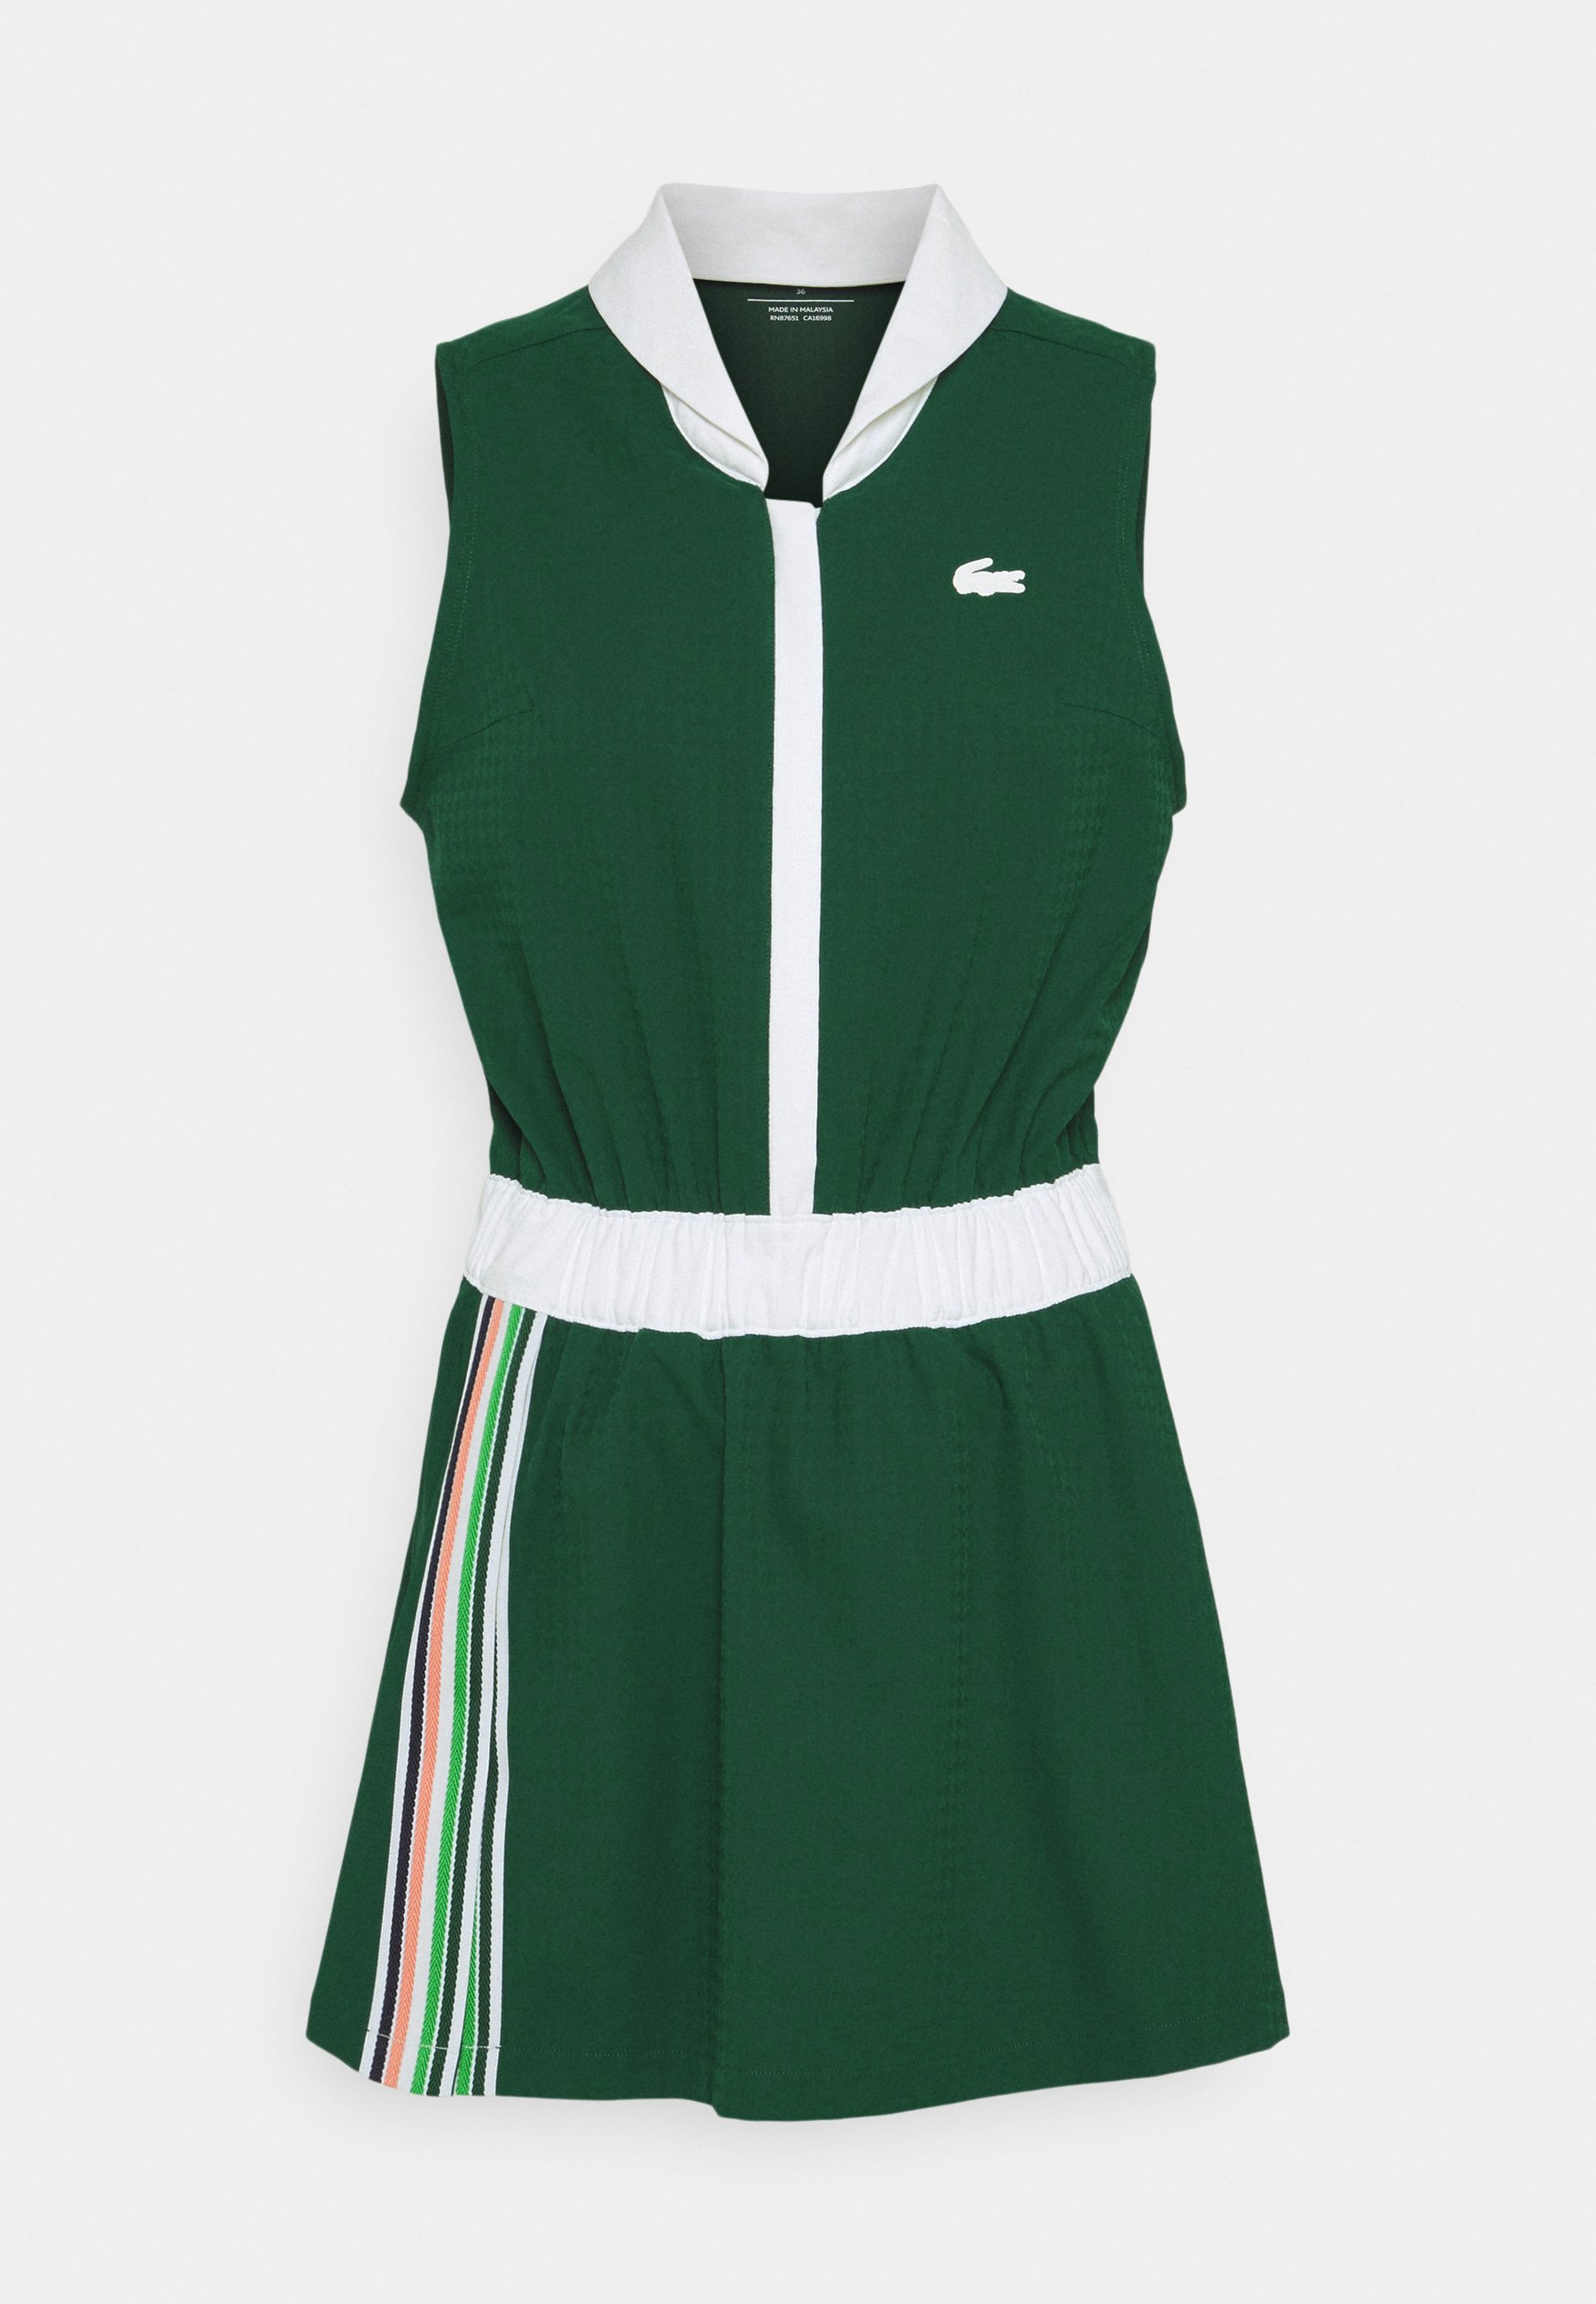 Donna TENNIS DRESS - Abbigliamento sportivo